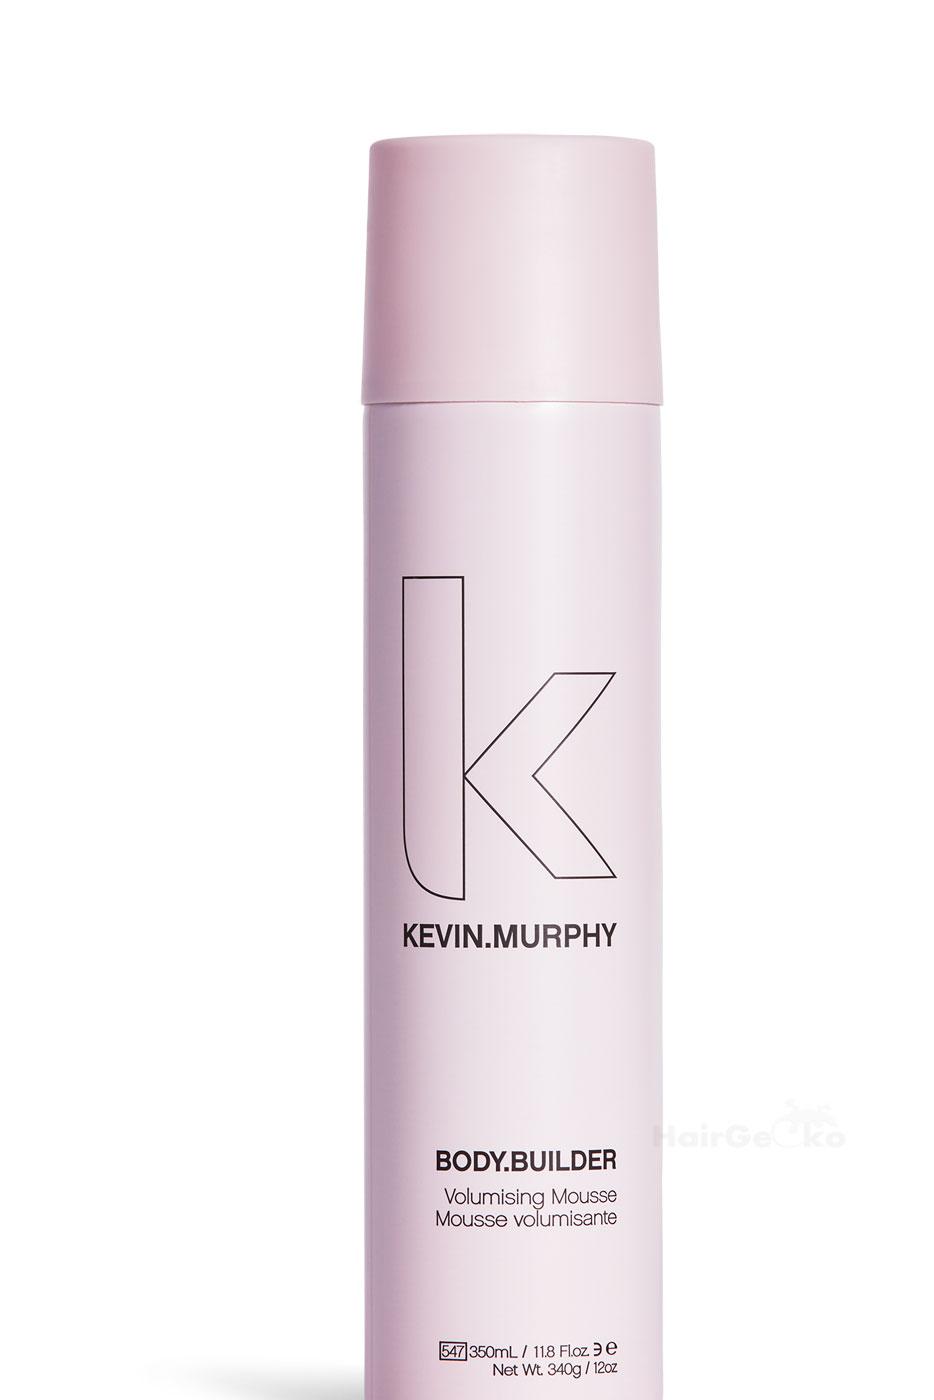 KEVIN.MURPHY BODY.BUILDER 375 ml